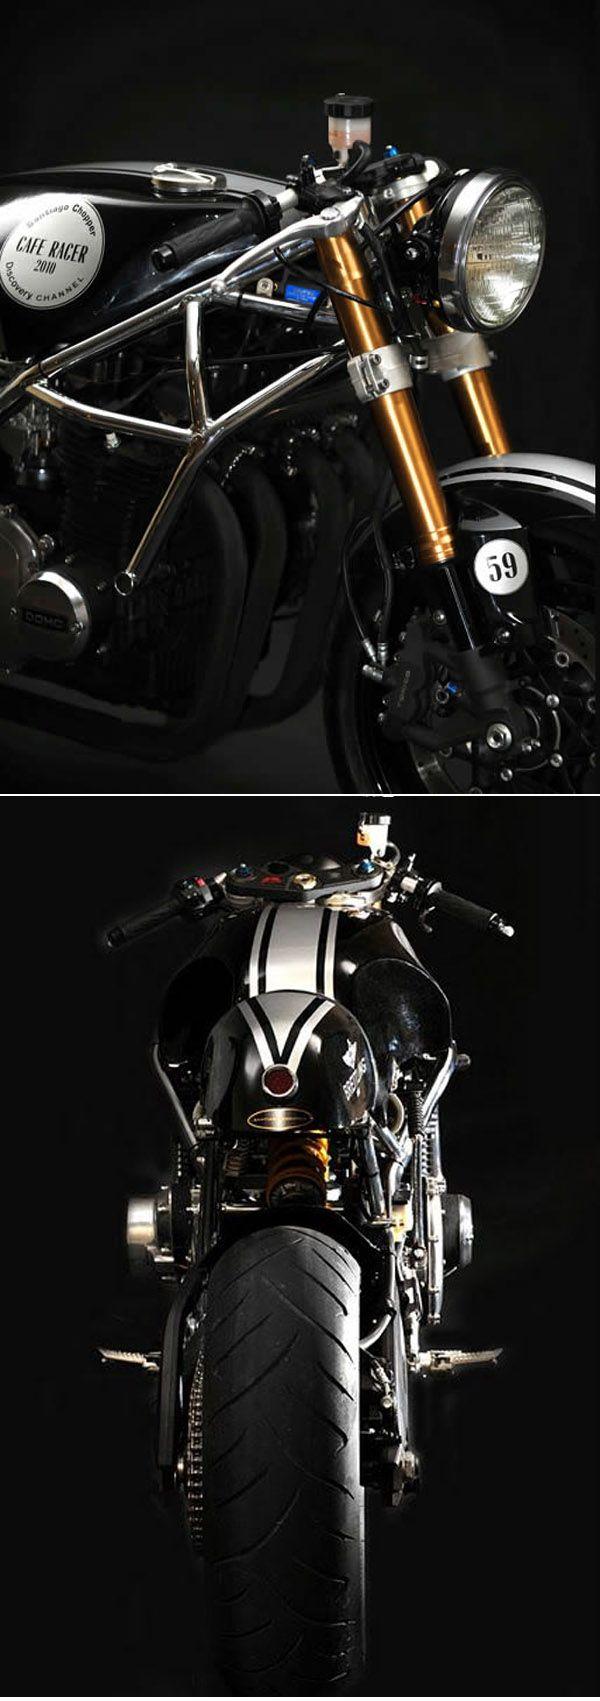 Kawasaki Z1000 Café Racer by Santiago Chopper